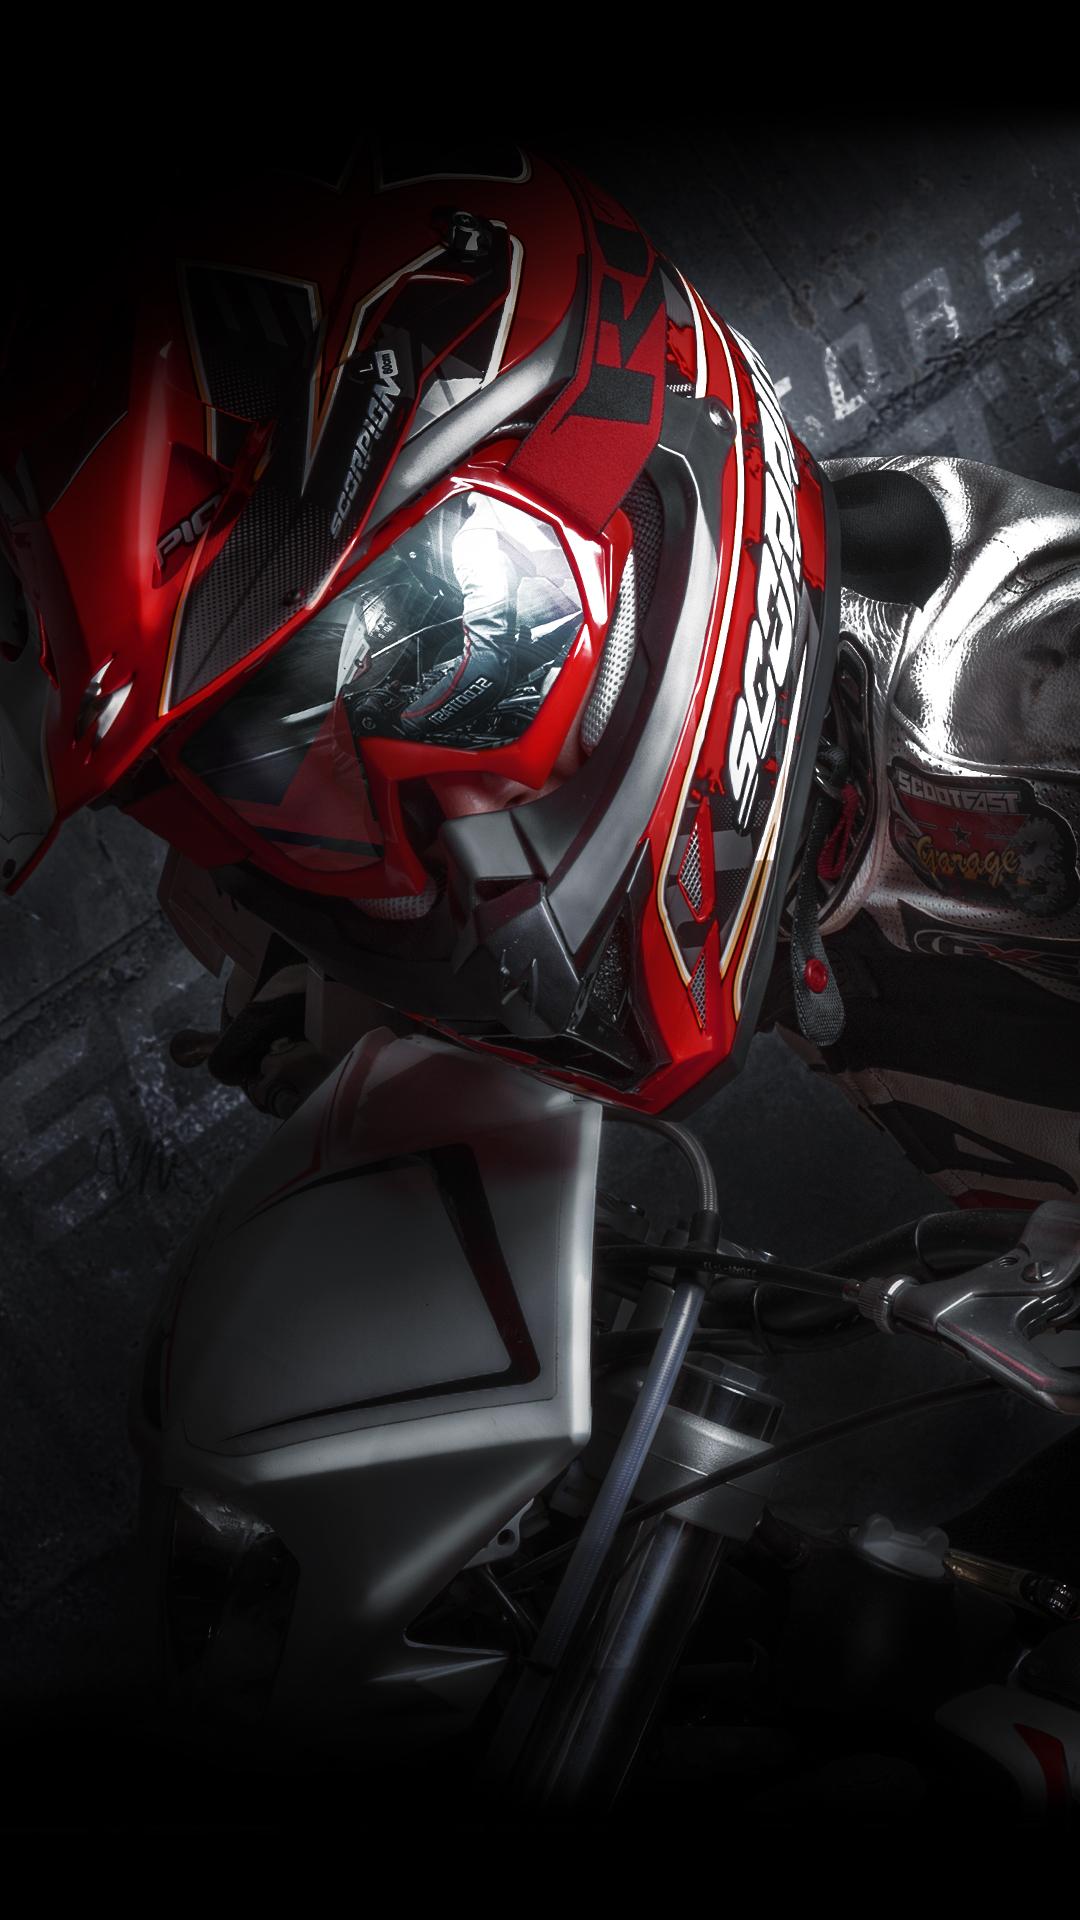 Os X Wallpapers Hd Scootfast Garage Fond D Ecran Scorpion Style By Sf